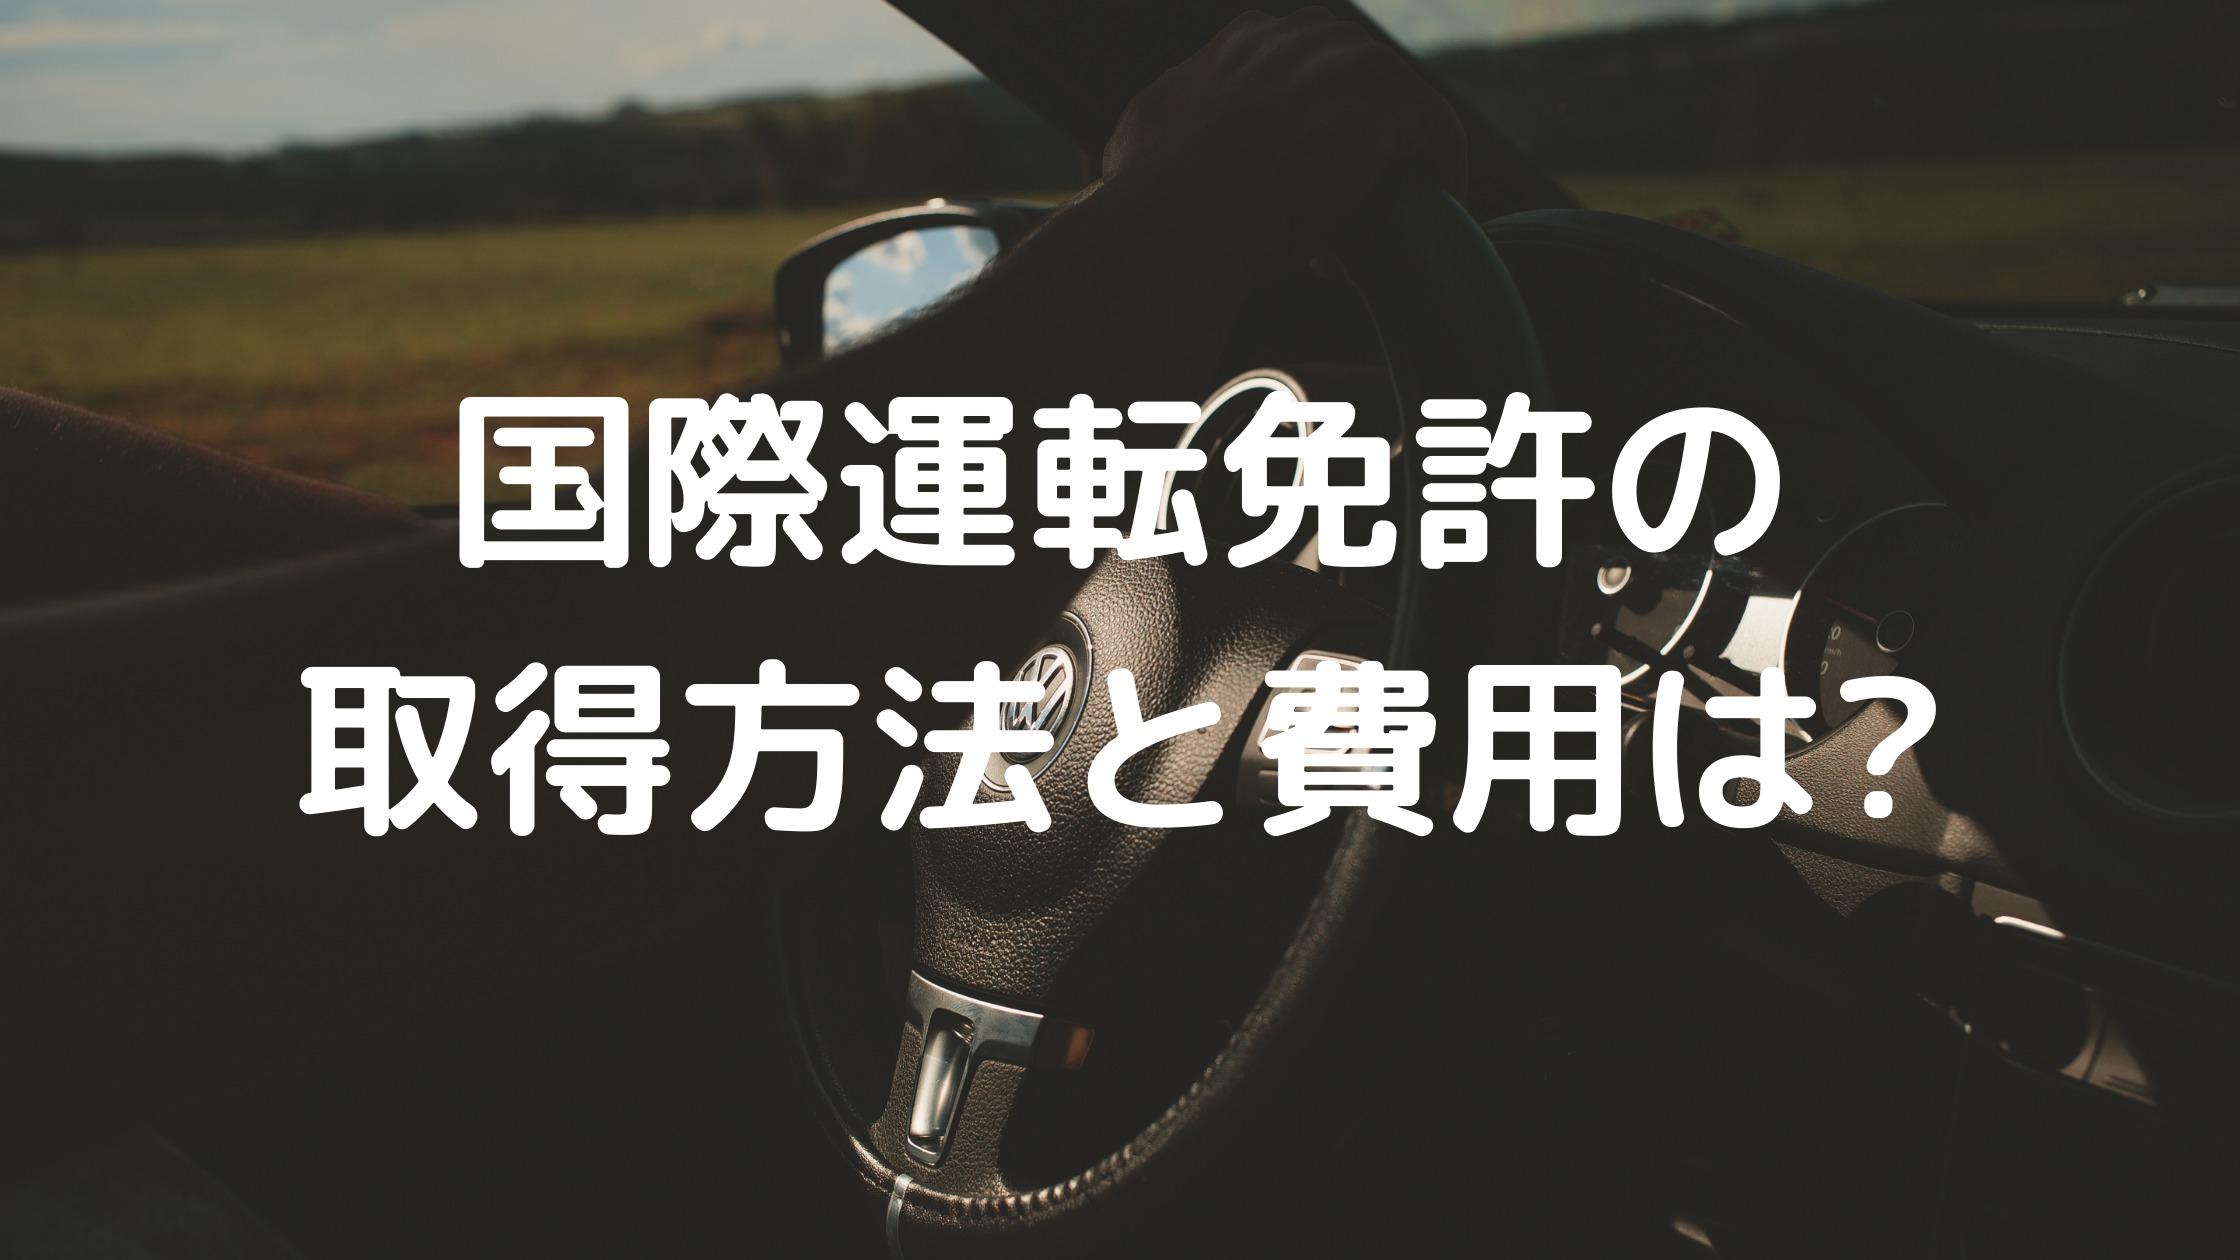 国際運転免許の写真